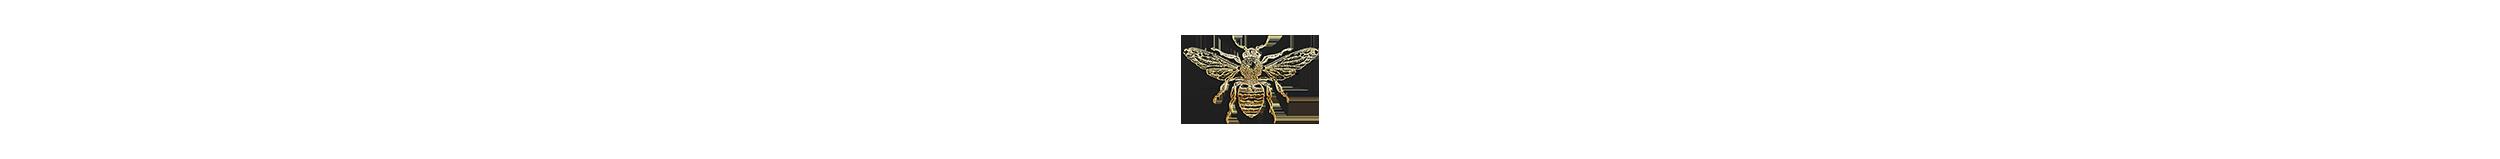 Bee Page Divider SWP crop.png